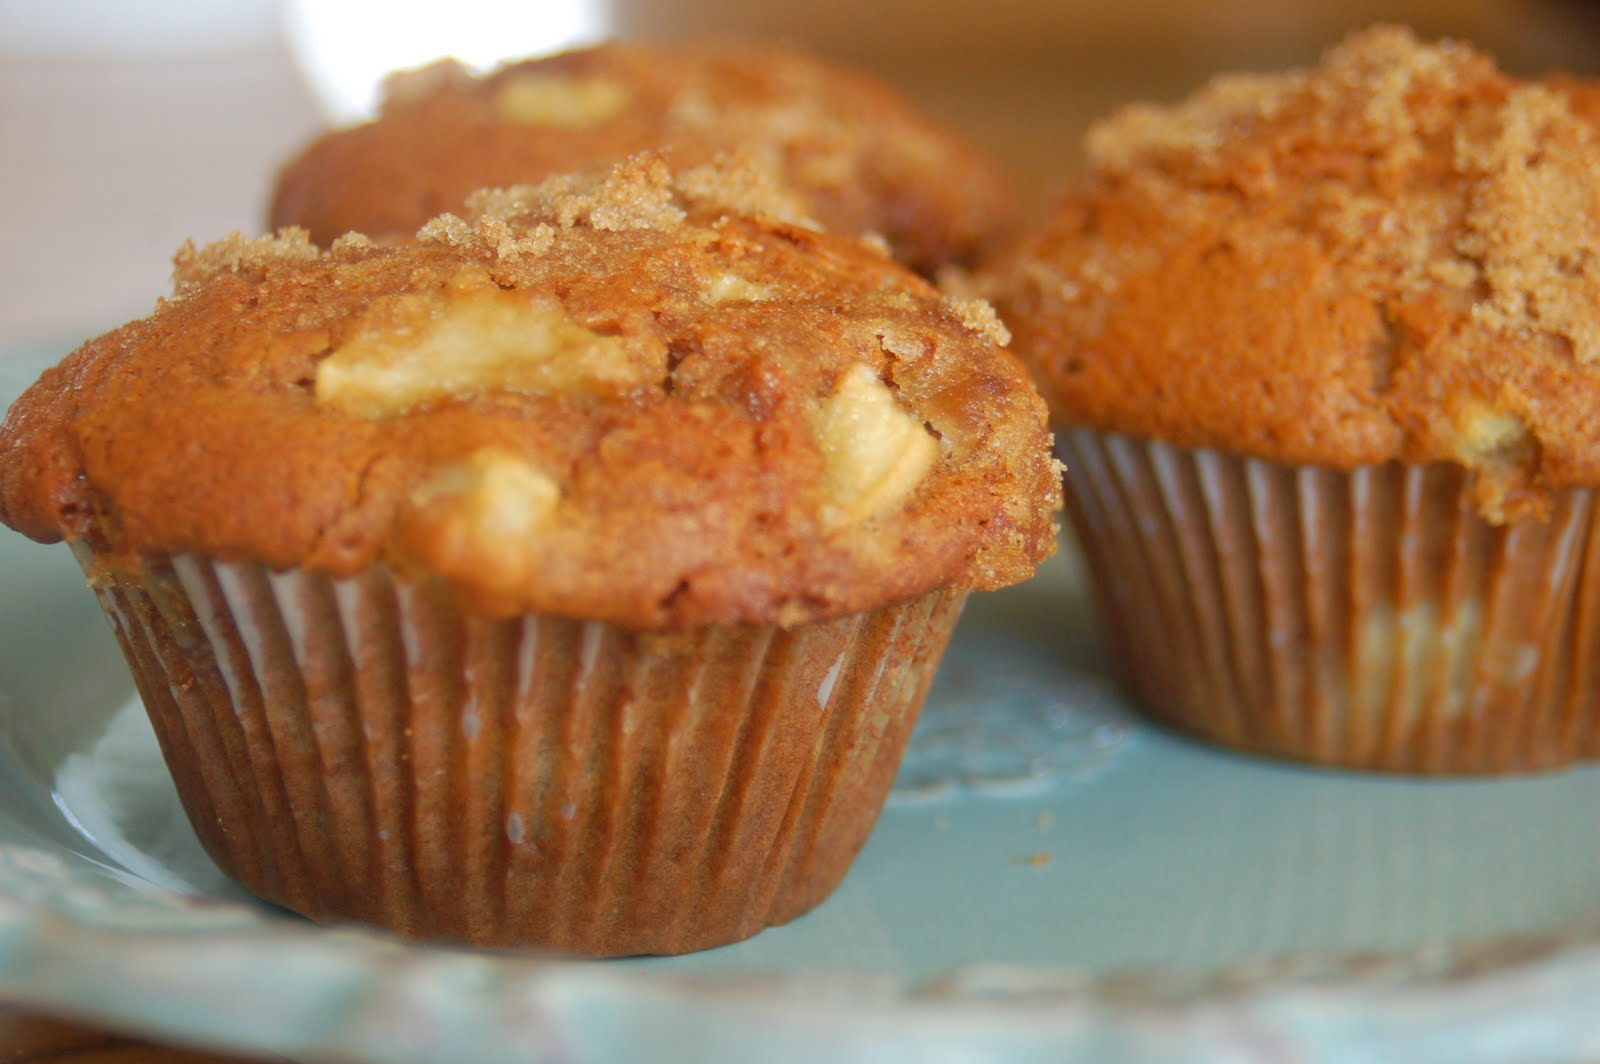 Fairview Farm: Whole Wheat Apple Muffins